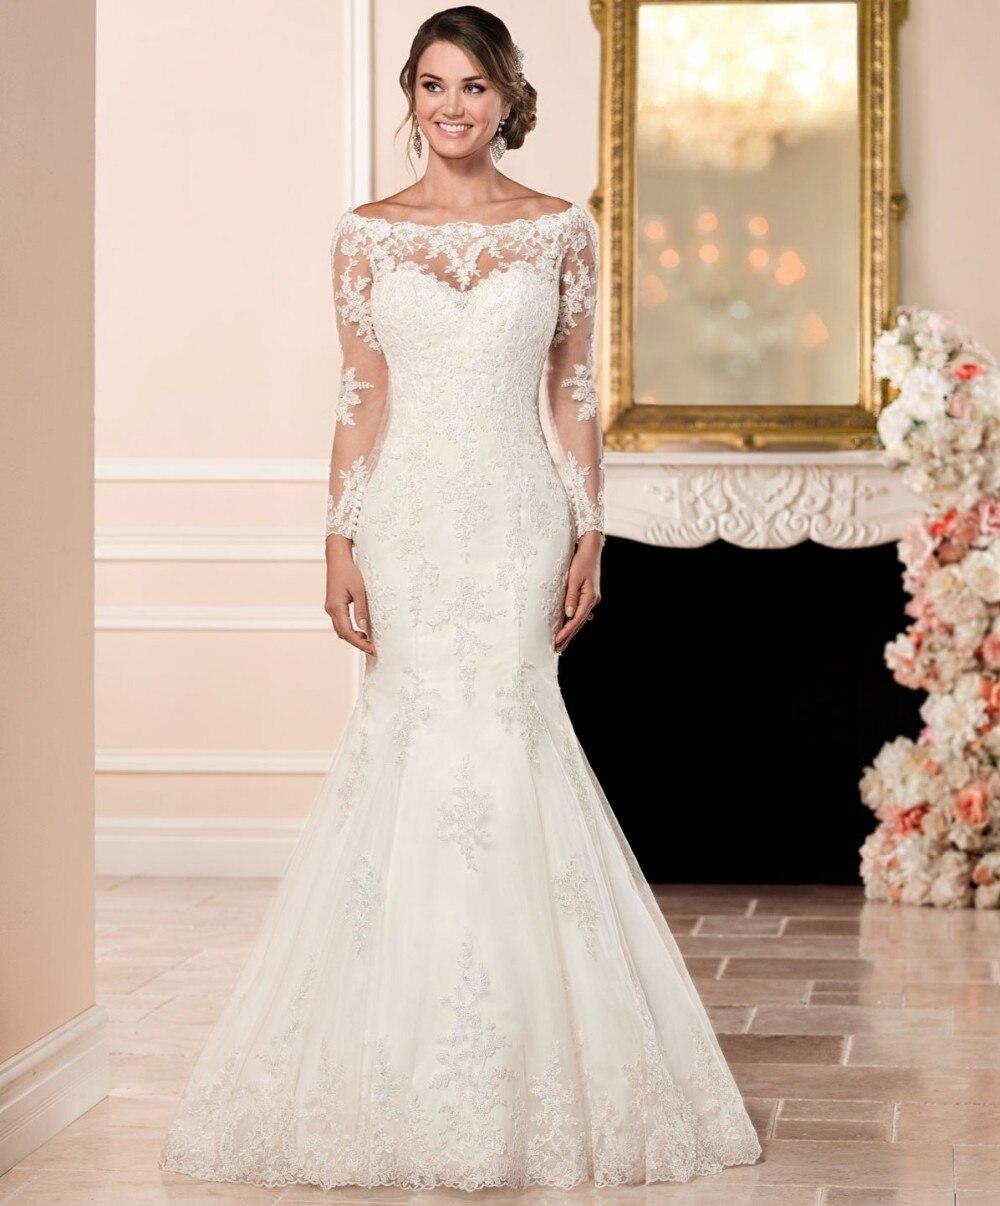 Hot Sale Vestidos De Noiva Customed Wedding Dress Simple Elegant Deep Round Neck Vintage Bridal Mermaid Dress Wedding Dresses Aliexpress